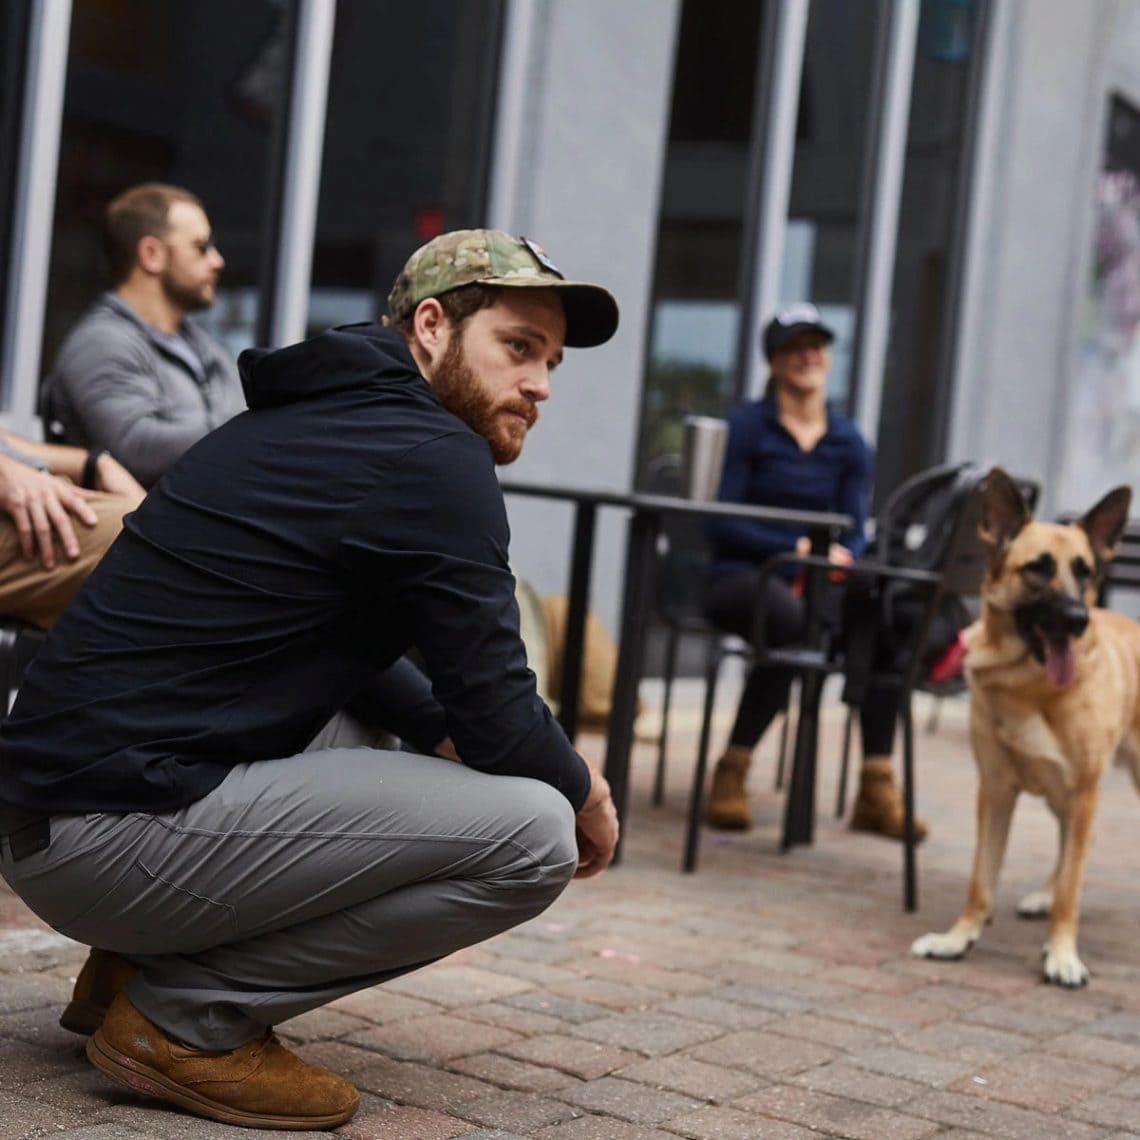 GORUCK Challenge Windbreaker (Black) with dog